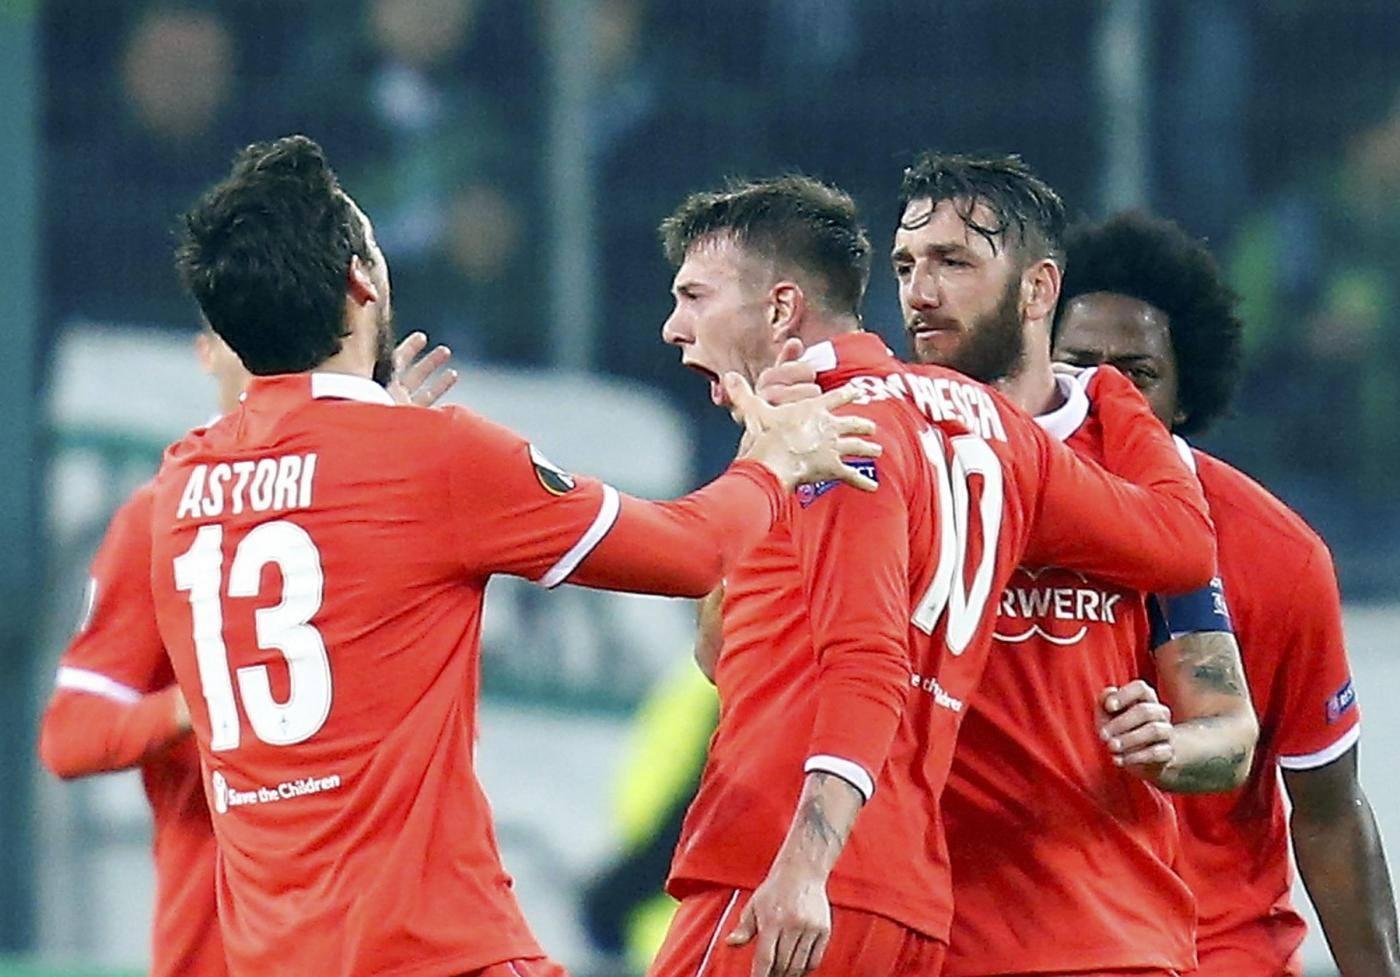 Borussia Moenchengladbach vs ACF Fiorentina UEFA Europa League